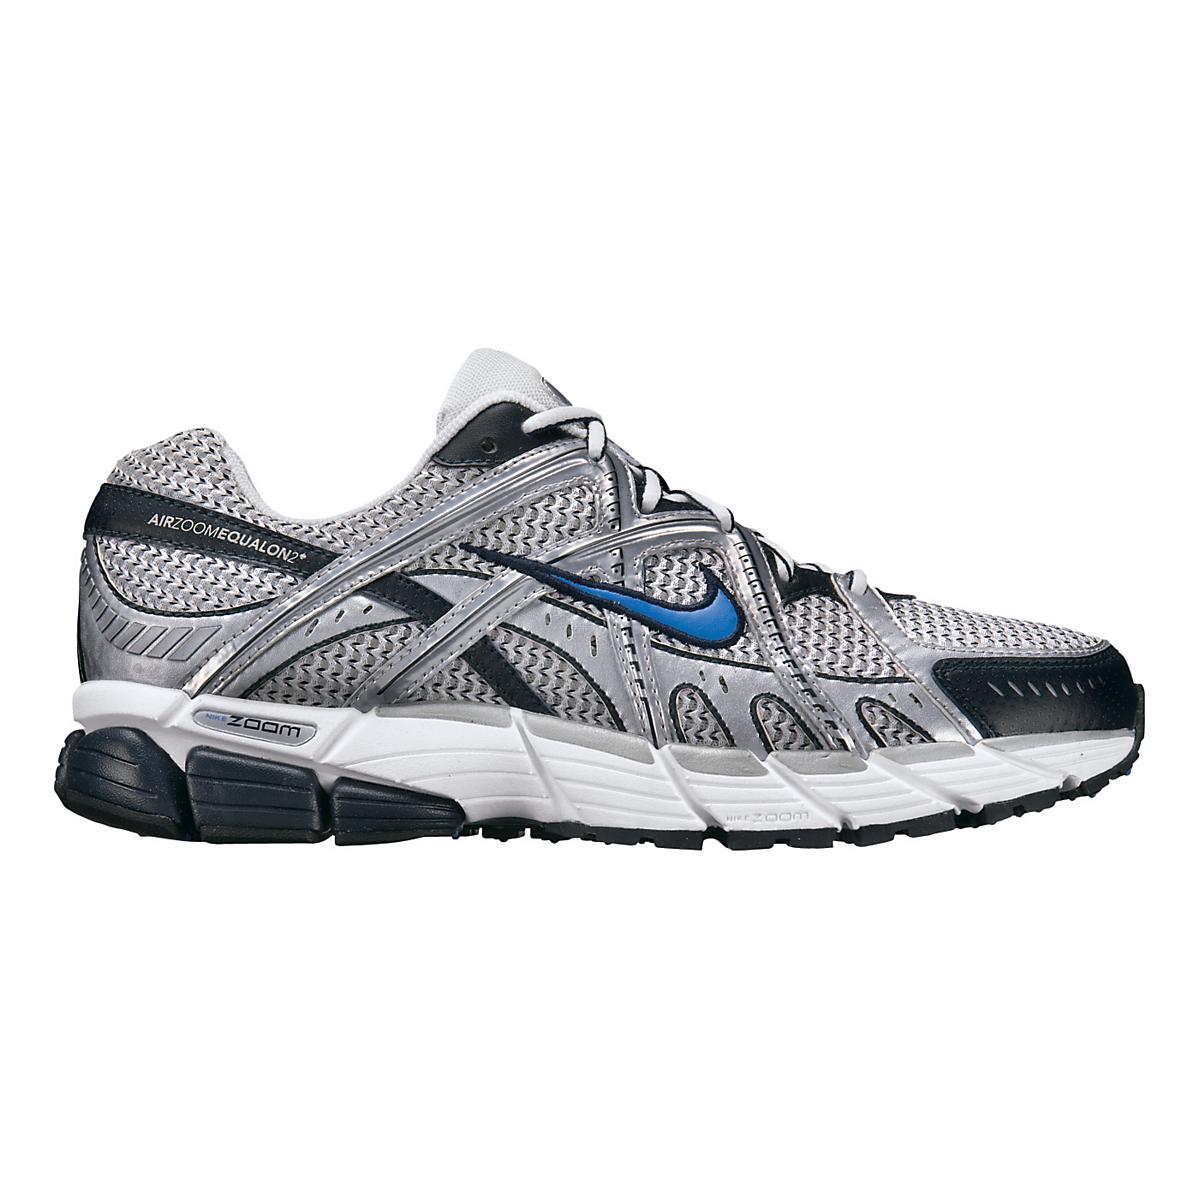 a97195334 Mens Nike Air Equalon+ 2 Running Shoe at Road Runner Sports